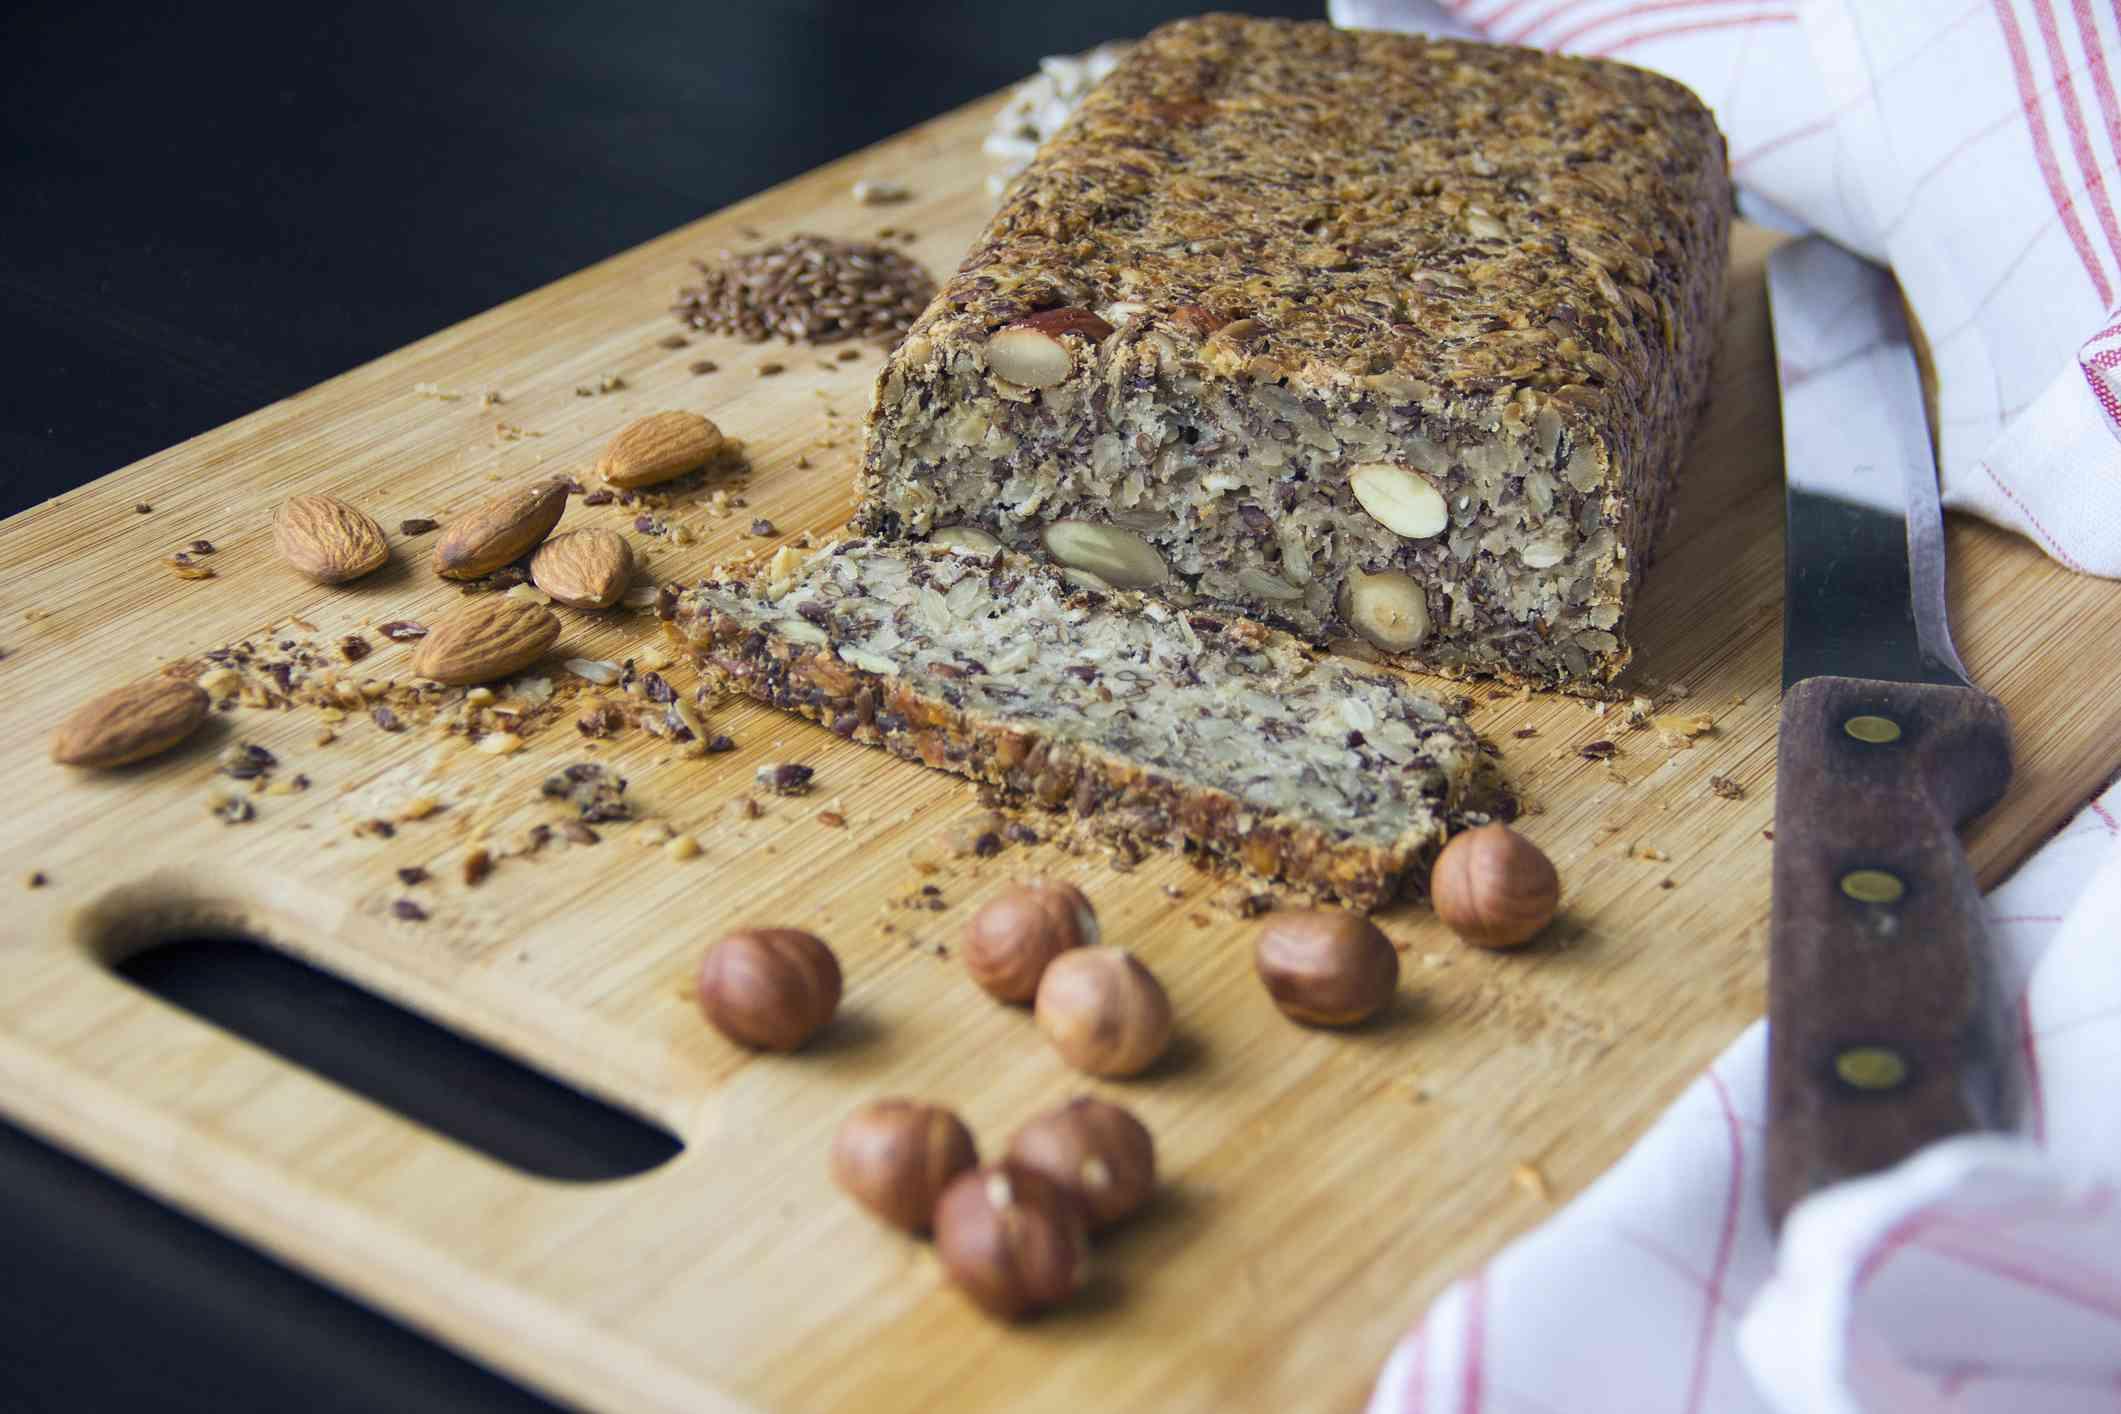 Fresh homemade keto bread with almonds, hazelnuts, sunflower seeds, chia seeds